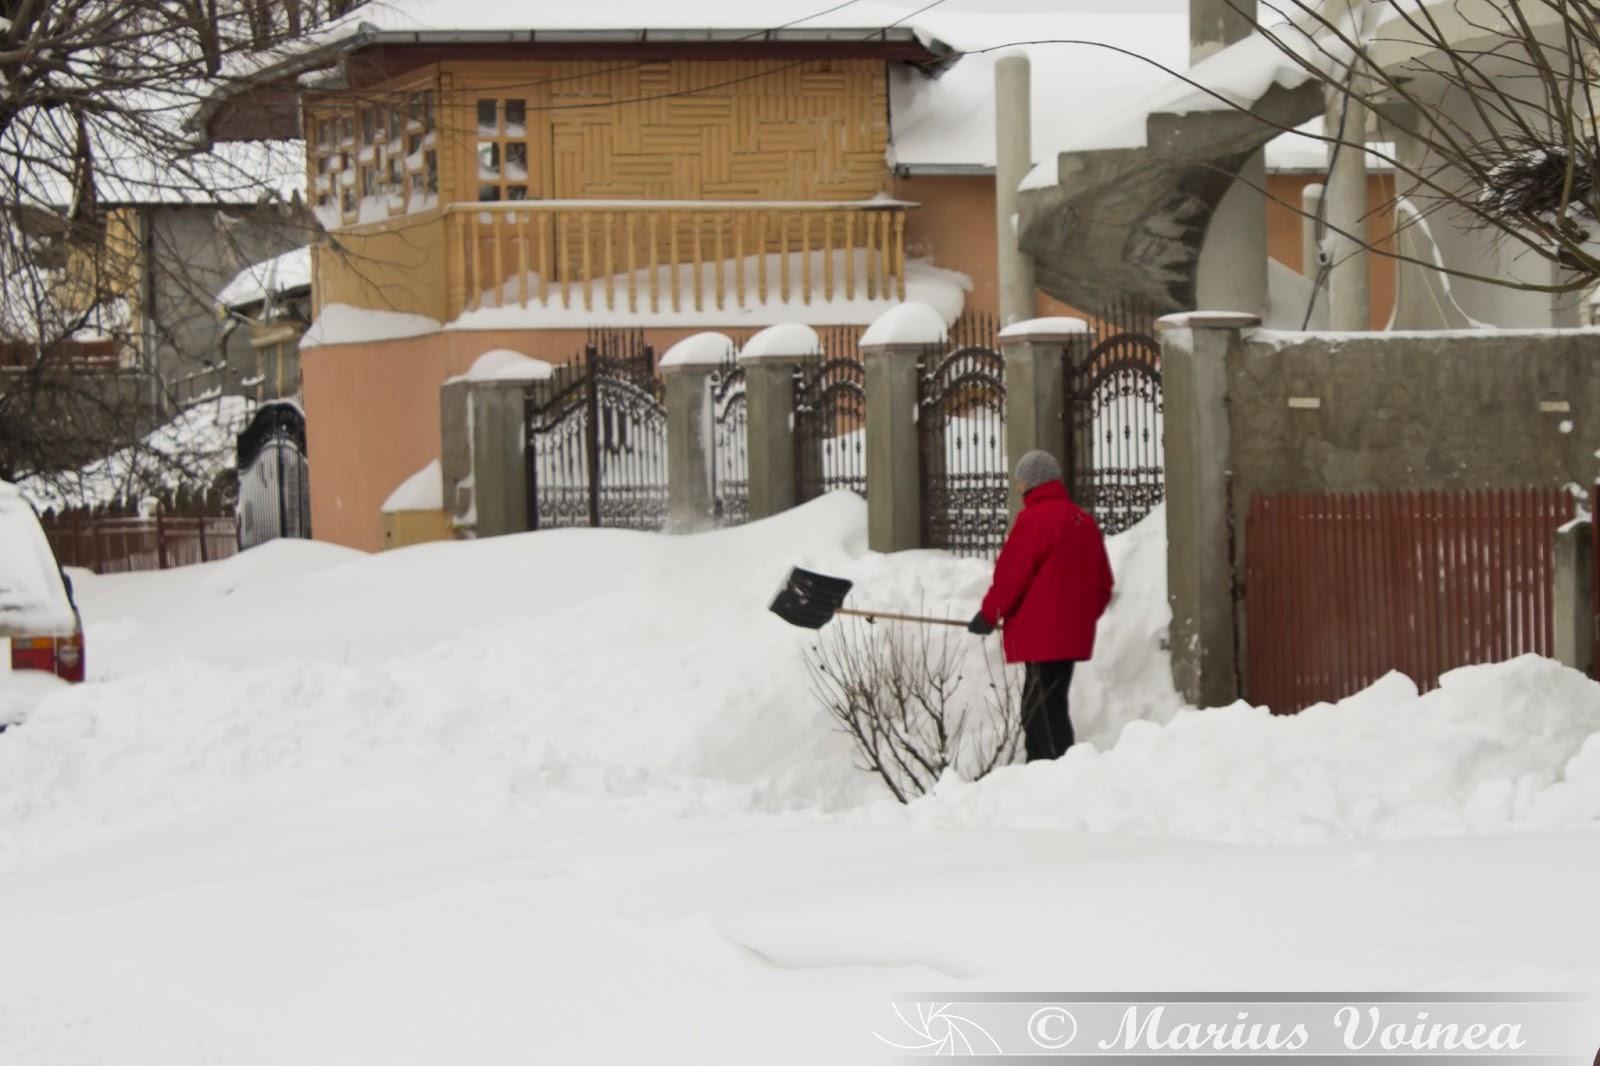 iarna la ramnicu sarat, 2014 foto 6